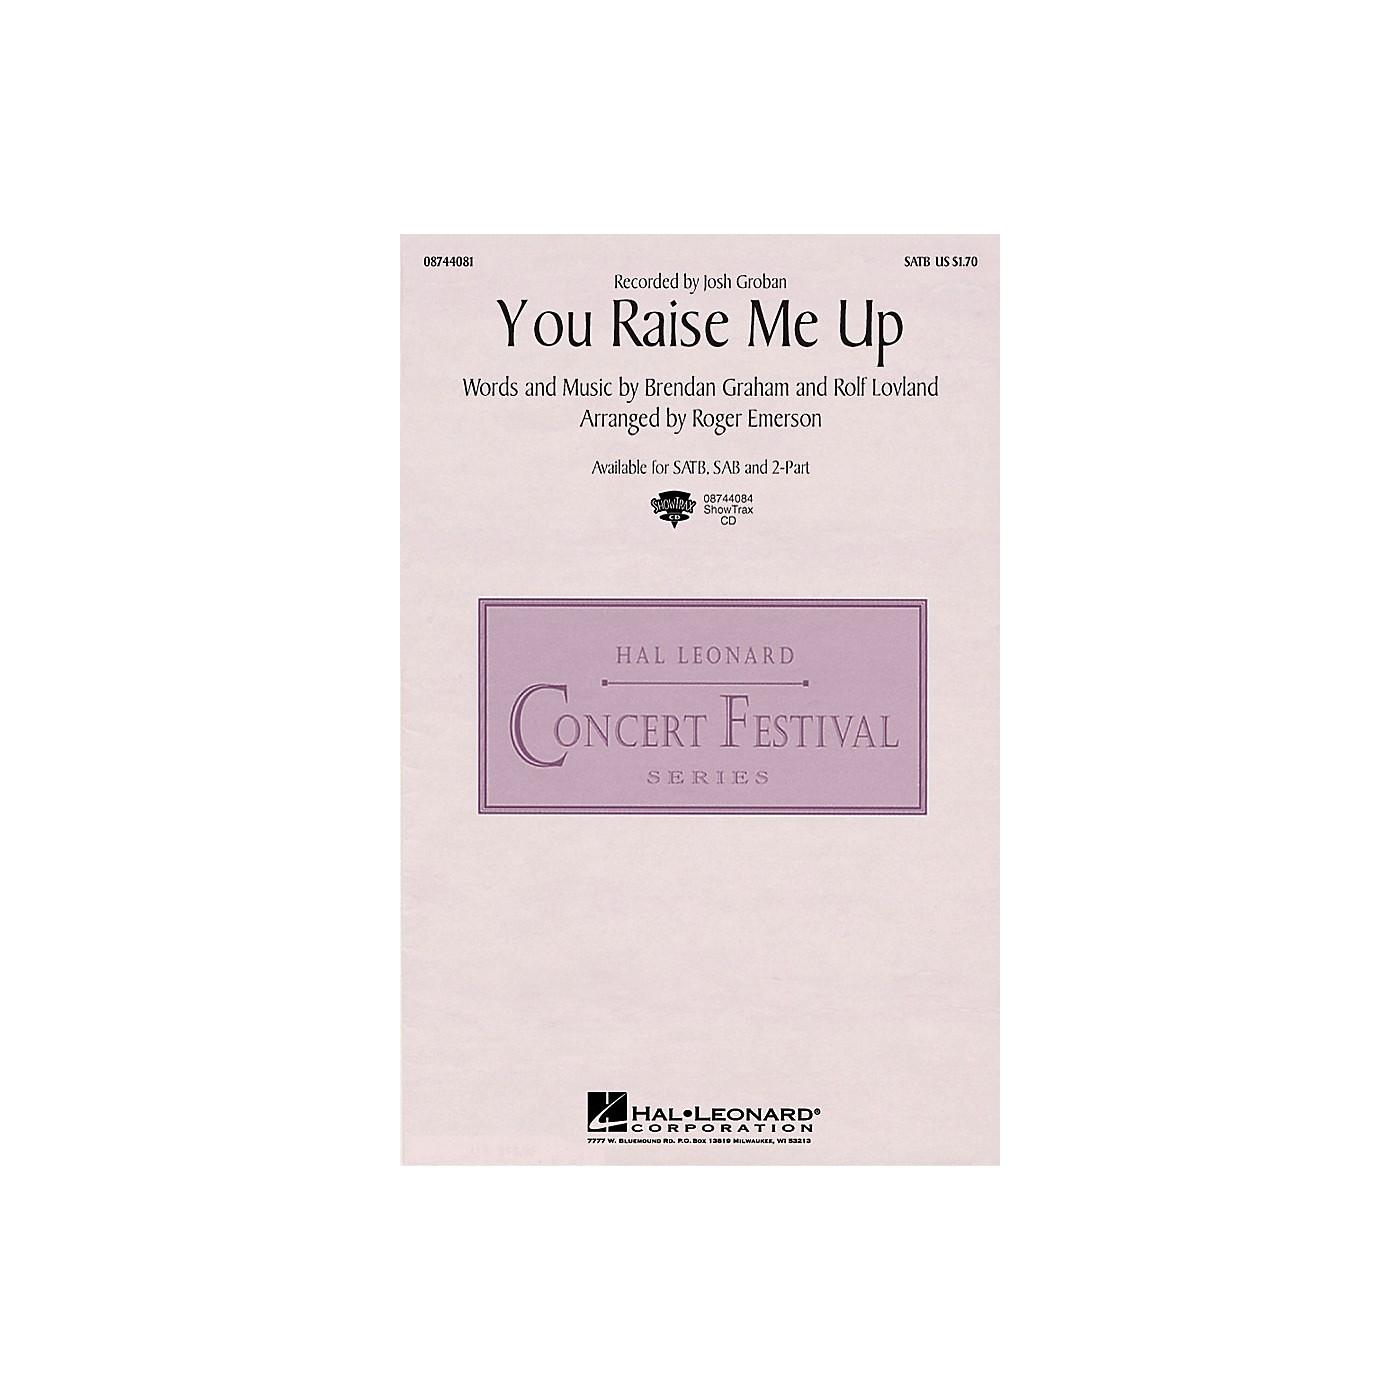 Hal Leonard You Raise Me Up SATB by Josh Groban arranged by Roger Emerson thumbnail